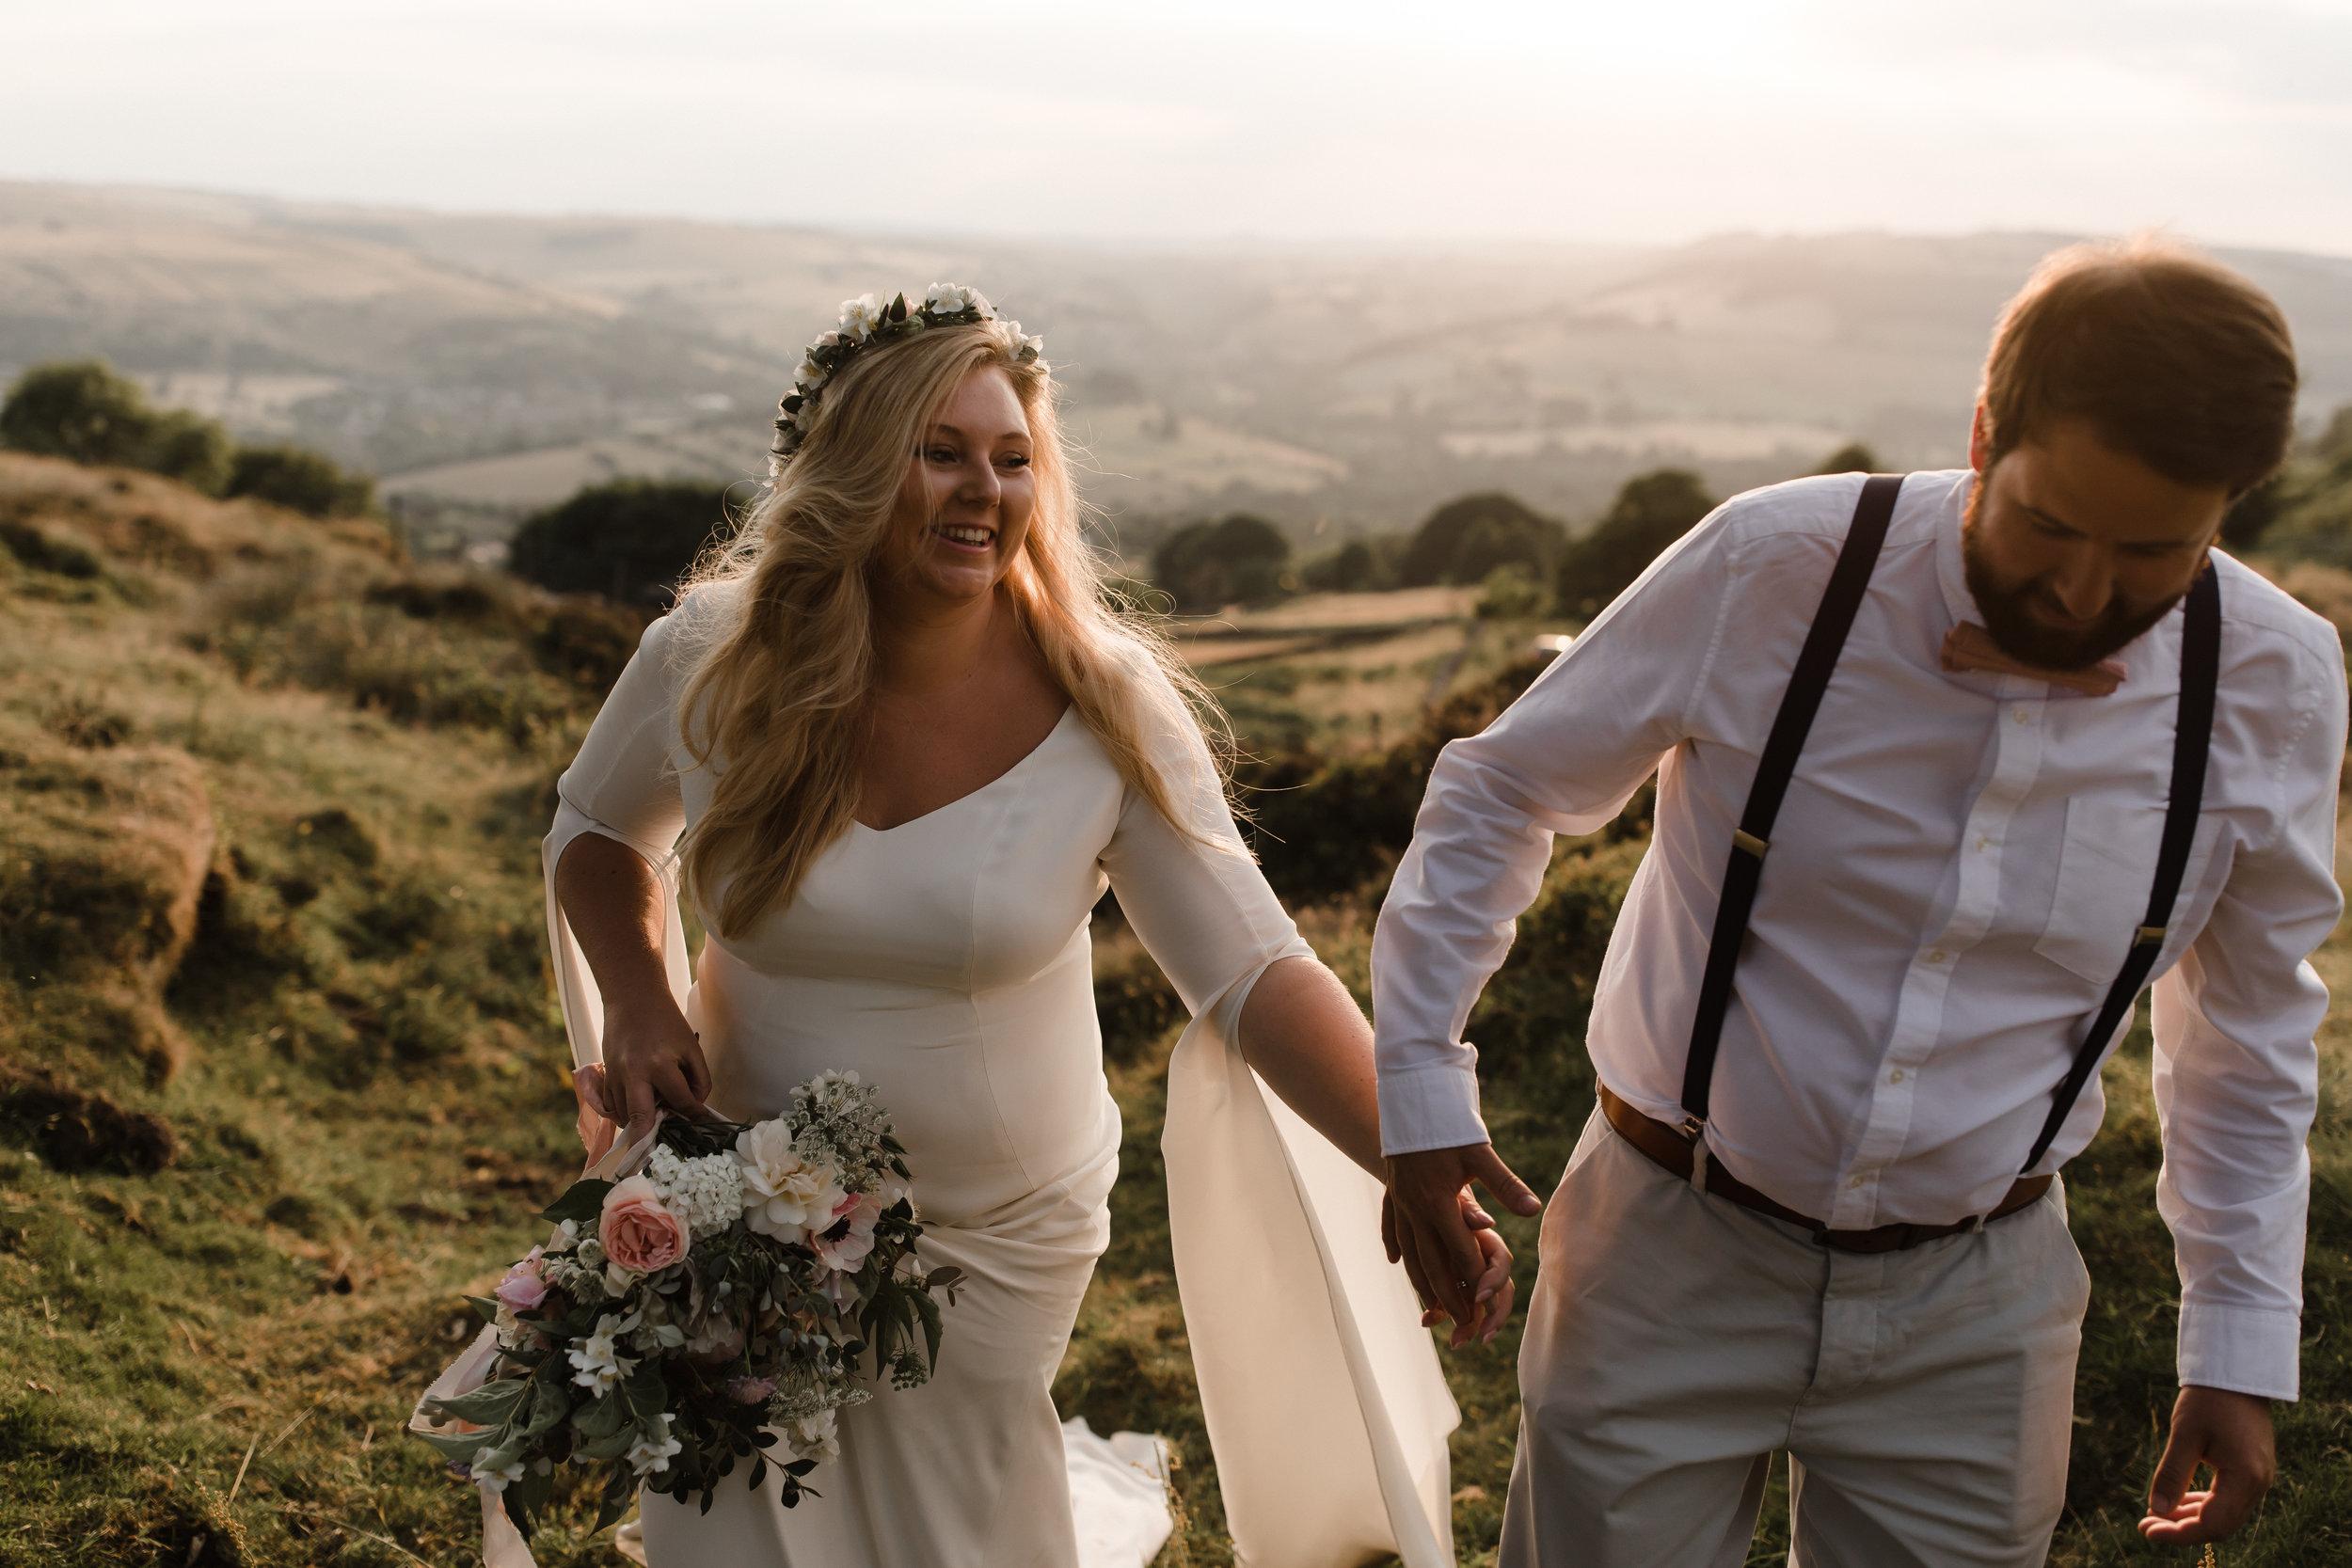 Lauren-Peak-District-Bespoke-Wedding-Gown-Petal-Veil-Train-Long-Sleeve-Susanna-Greening-Designs-Matlock-Derbyshire-20